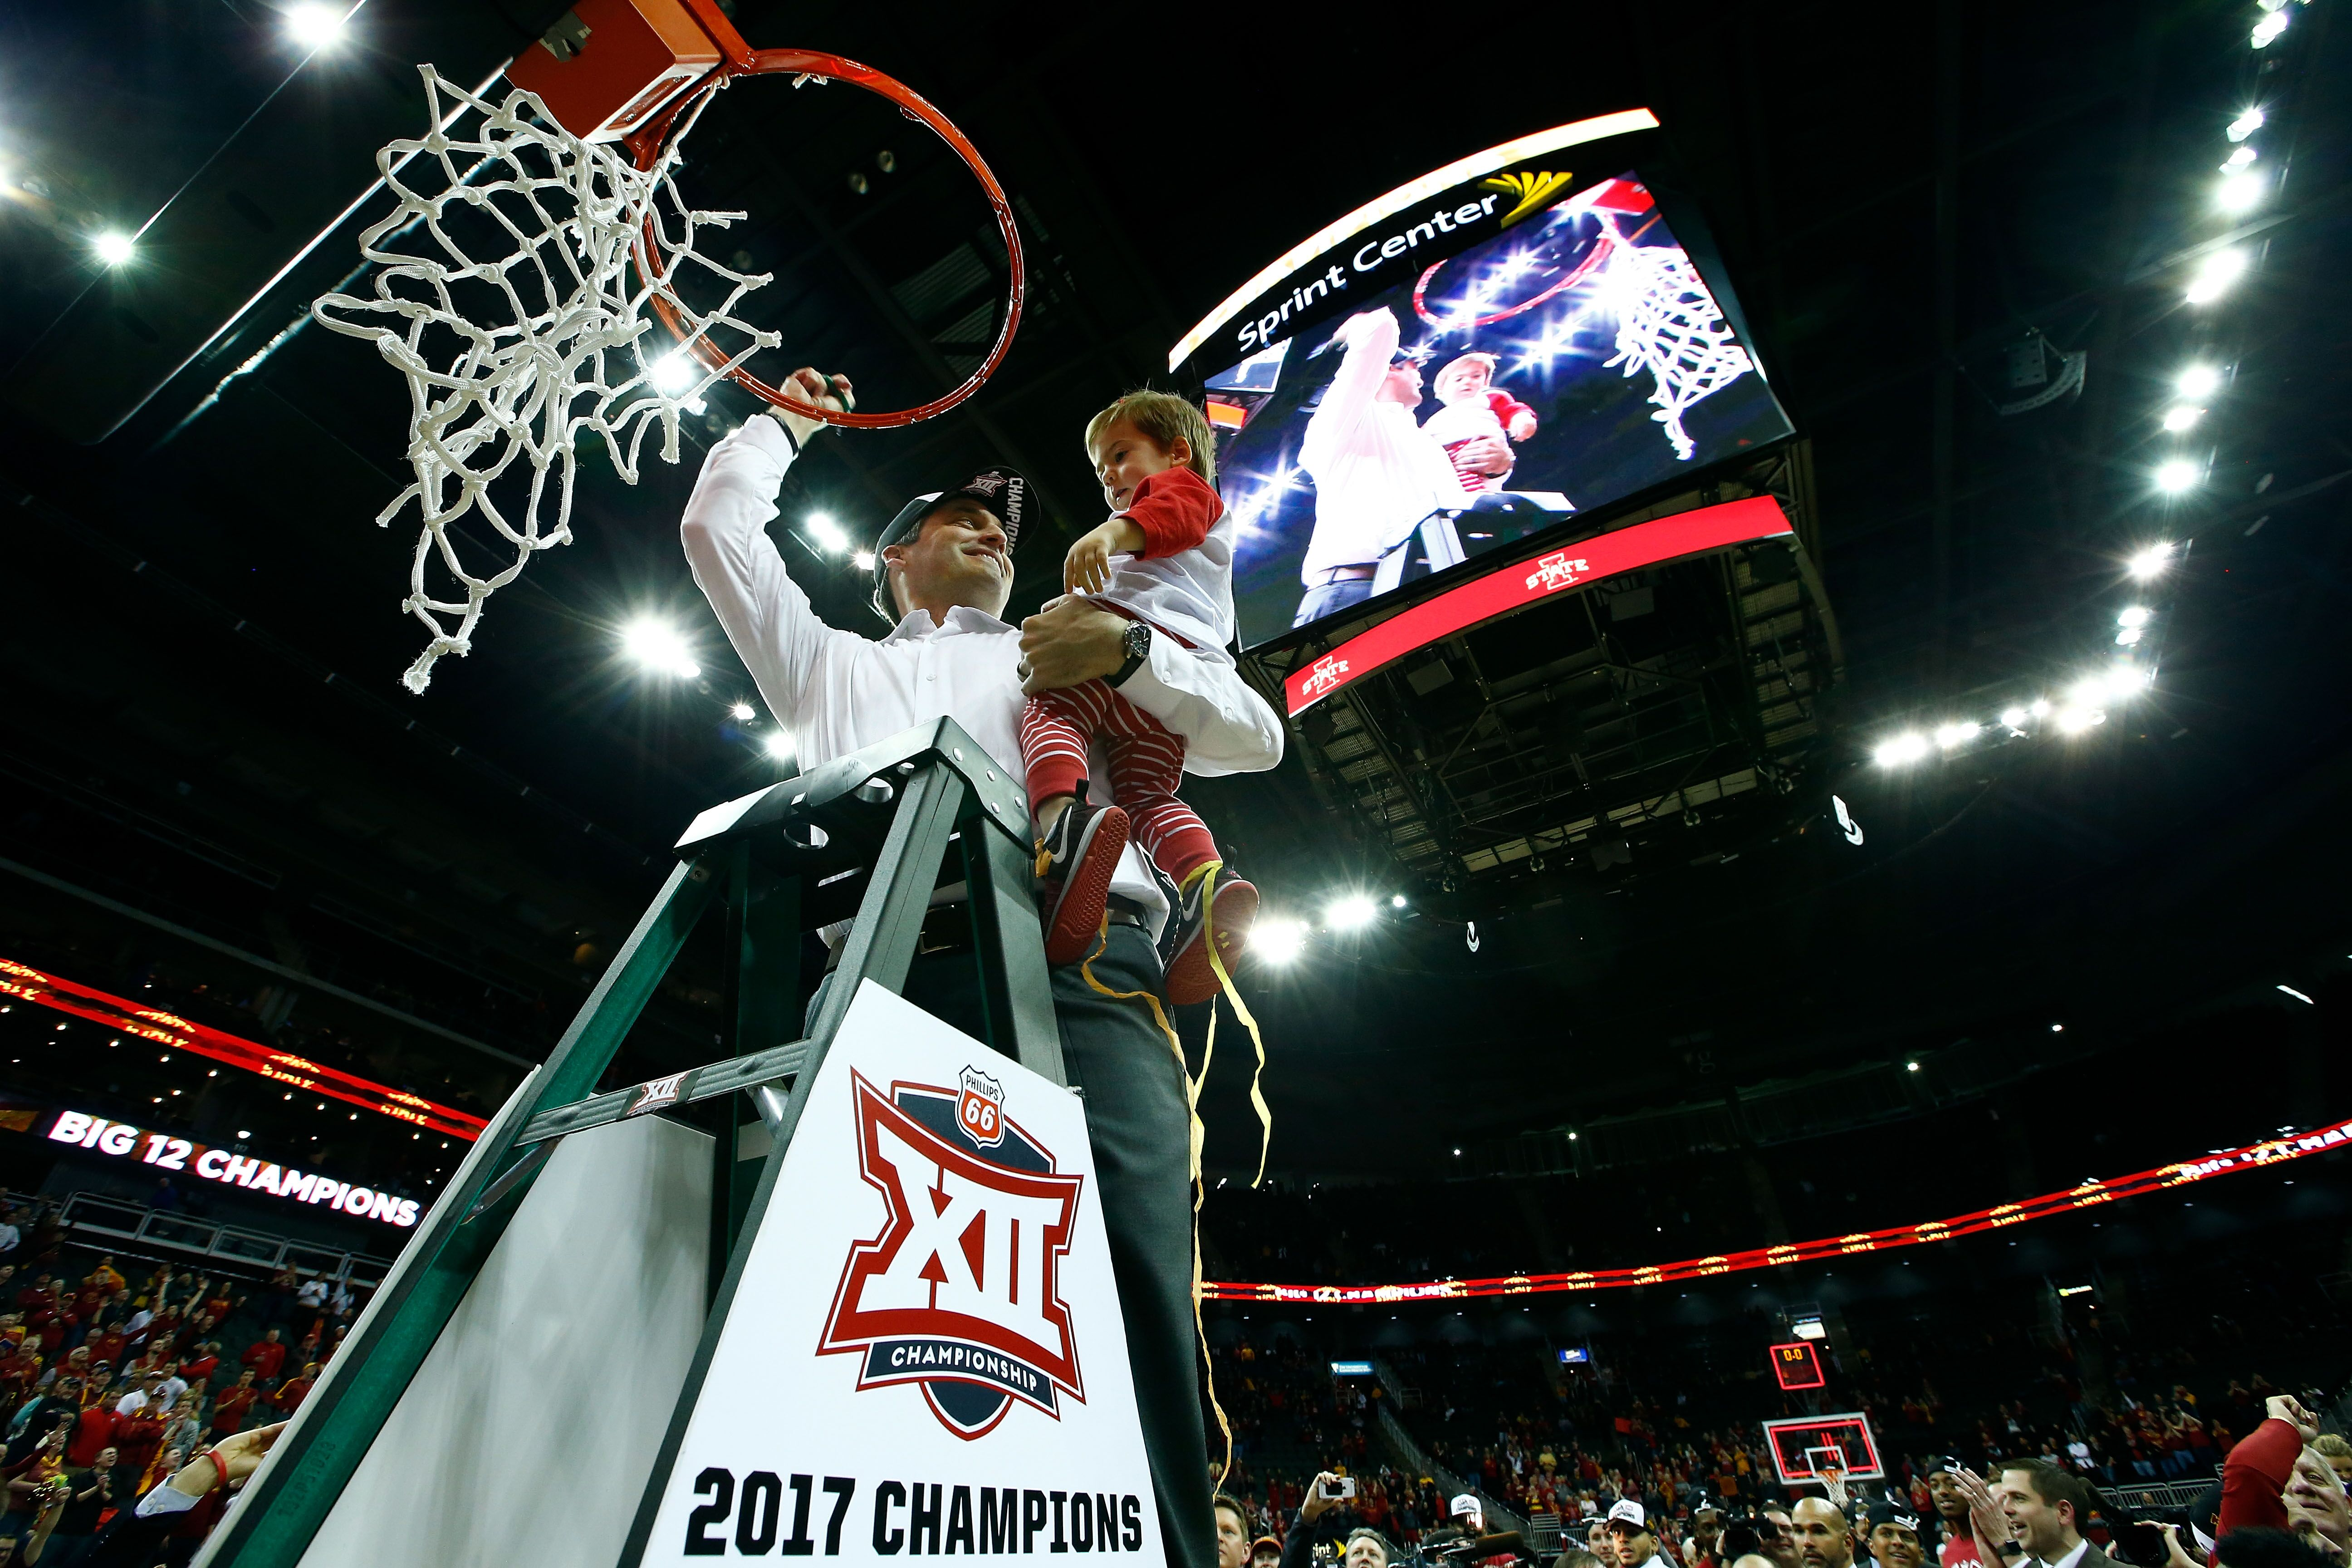 652254444-big-12-basketball-tournament-championship.jpg